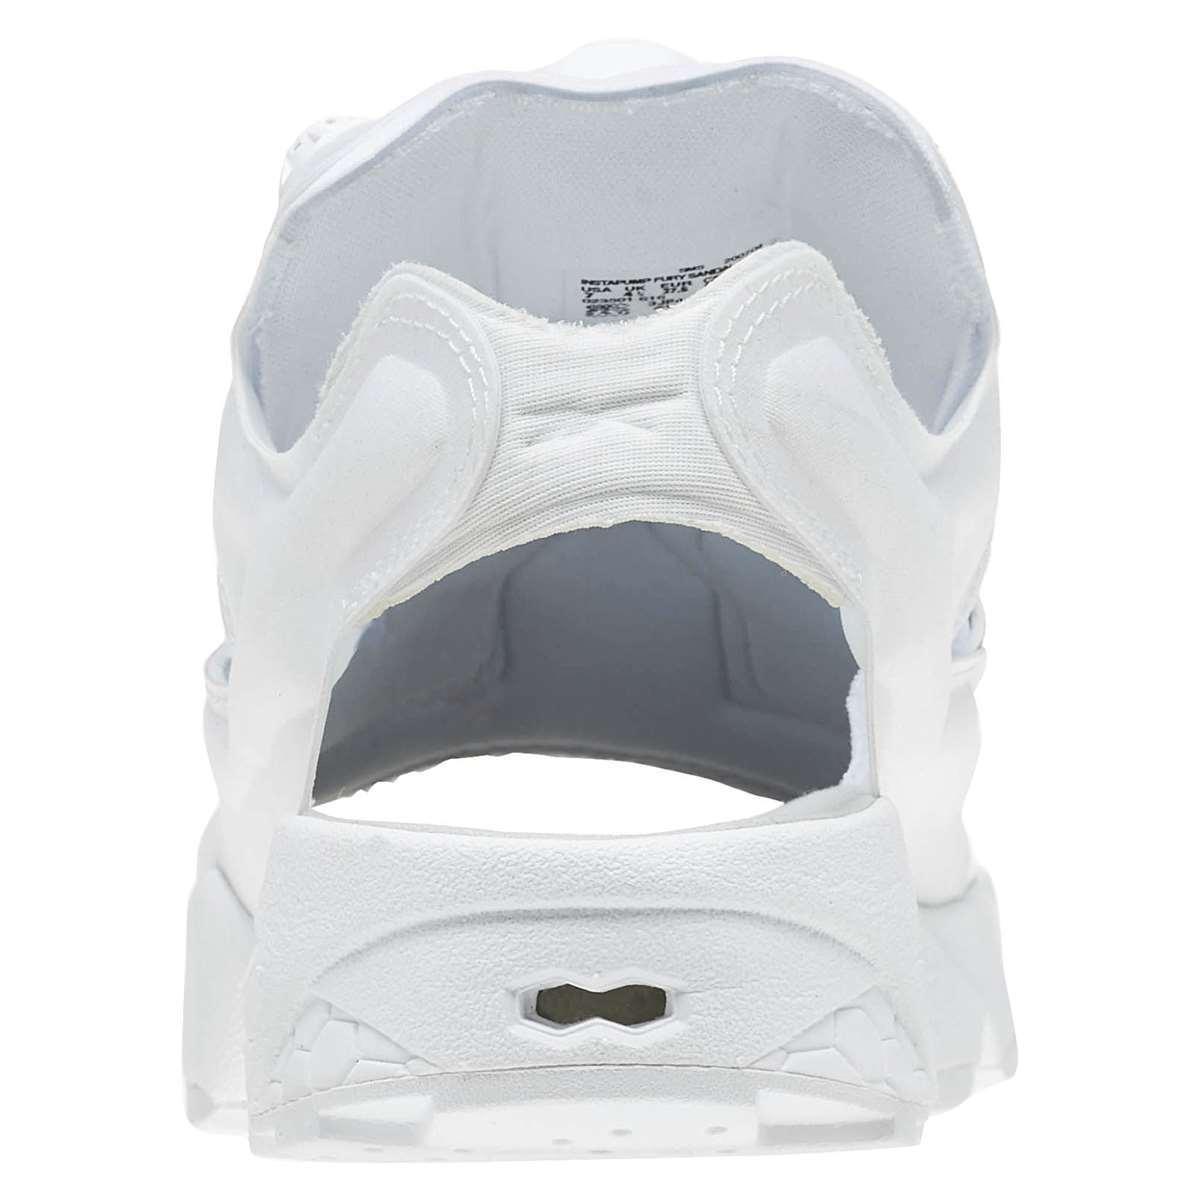 Reebok INSTAPUMP FURY Sandales Weiß BD3186 Slip On BD3186 Weiß Authentic NEW ad26df